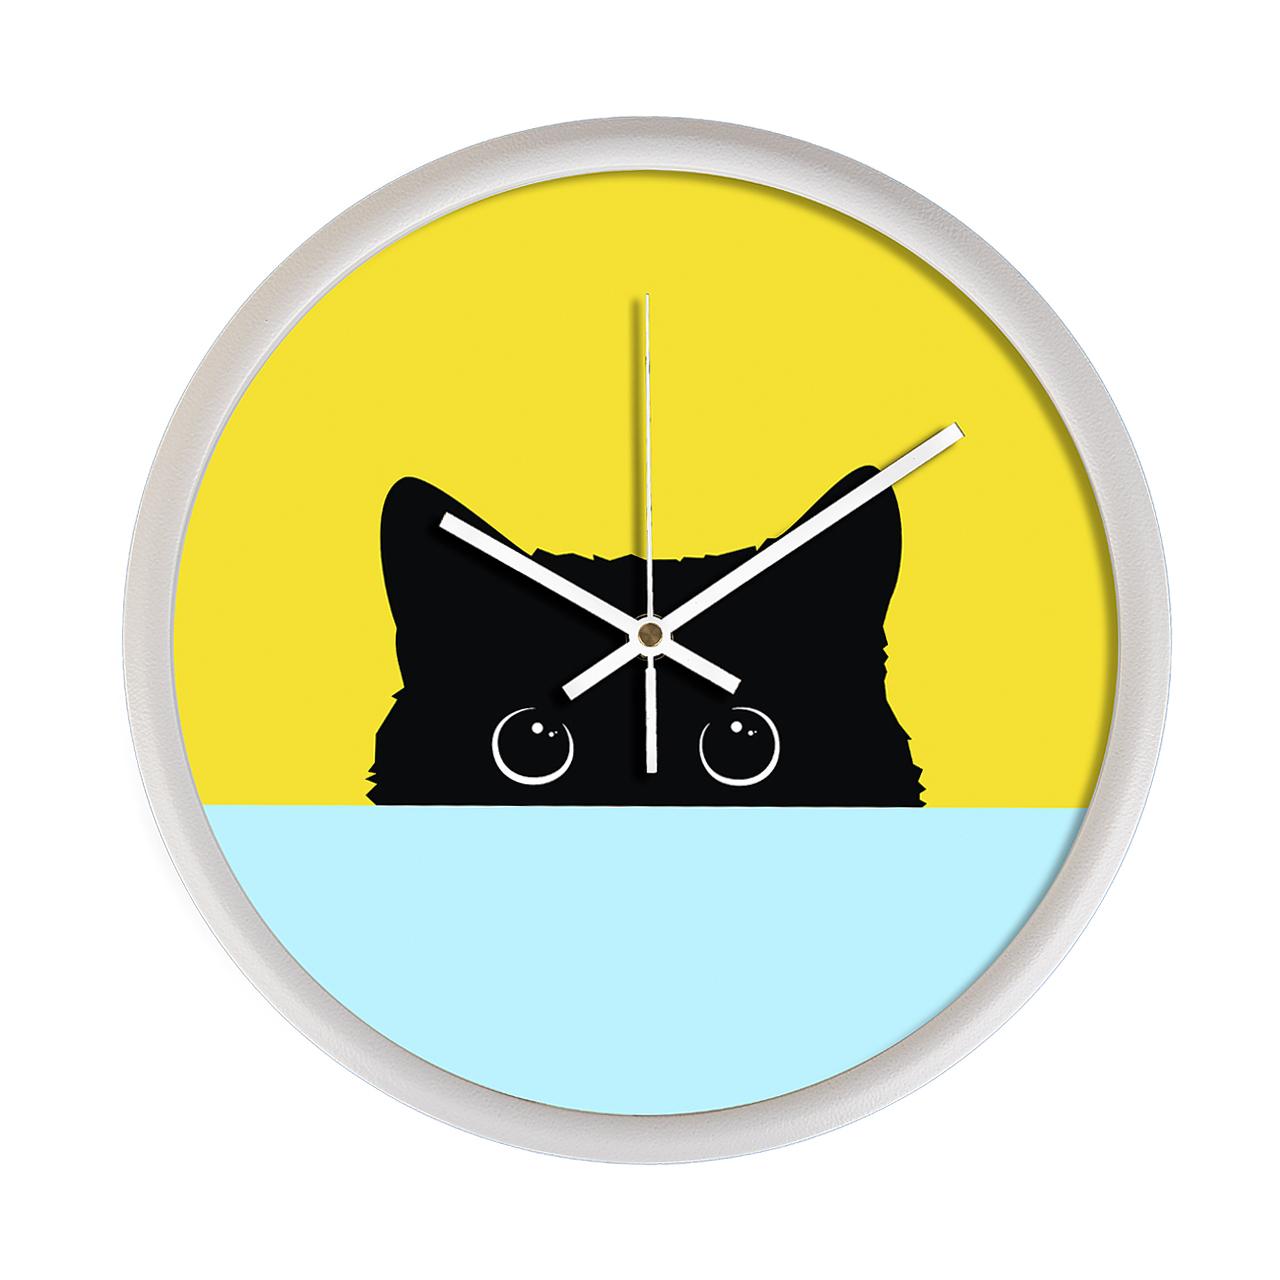 ساعت دیواری مینی مال لاکچری مدل 35Dio3_0304